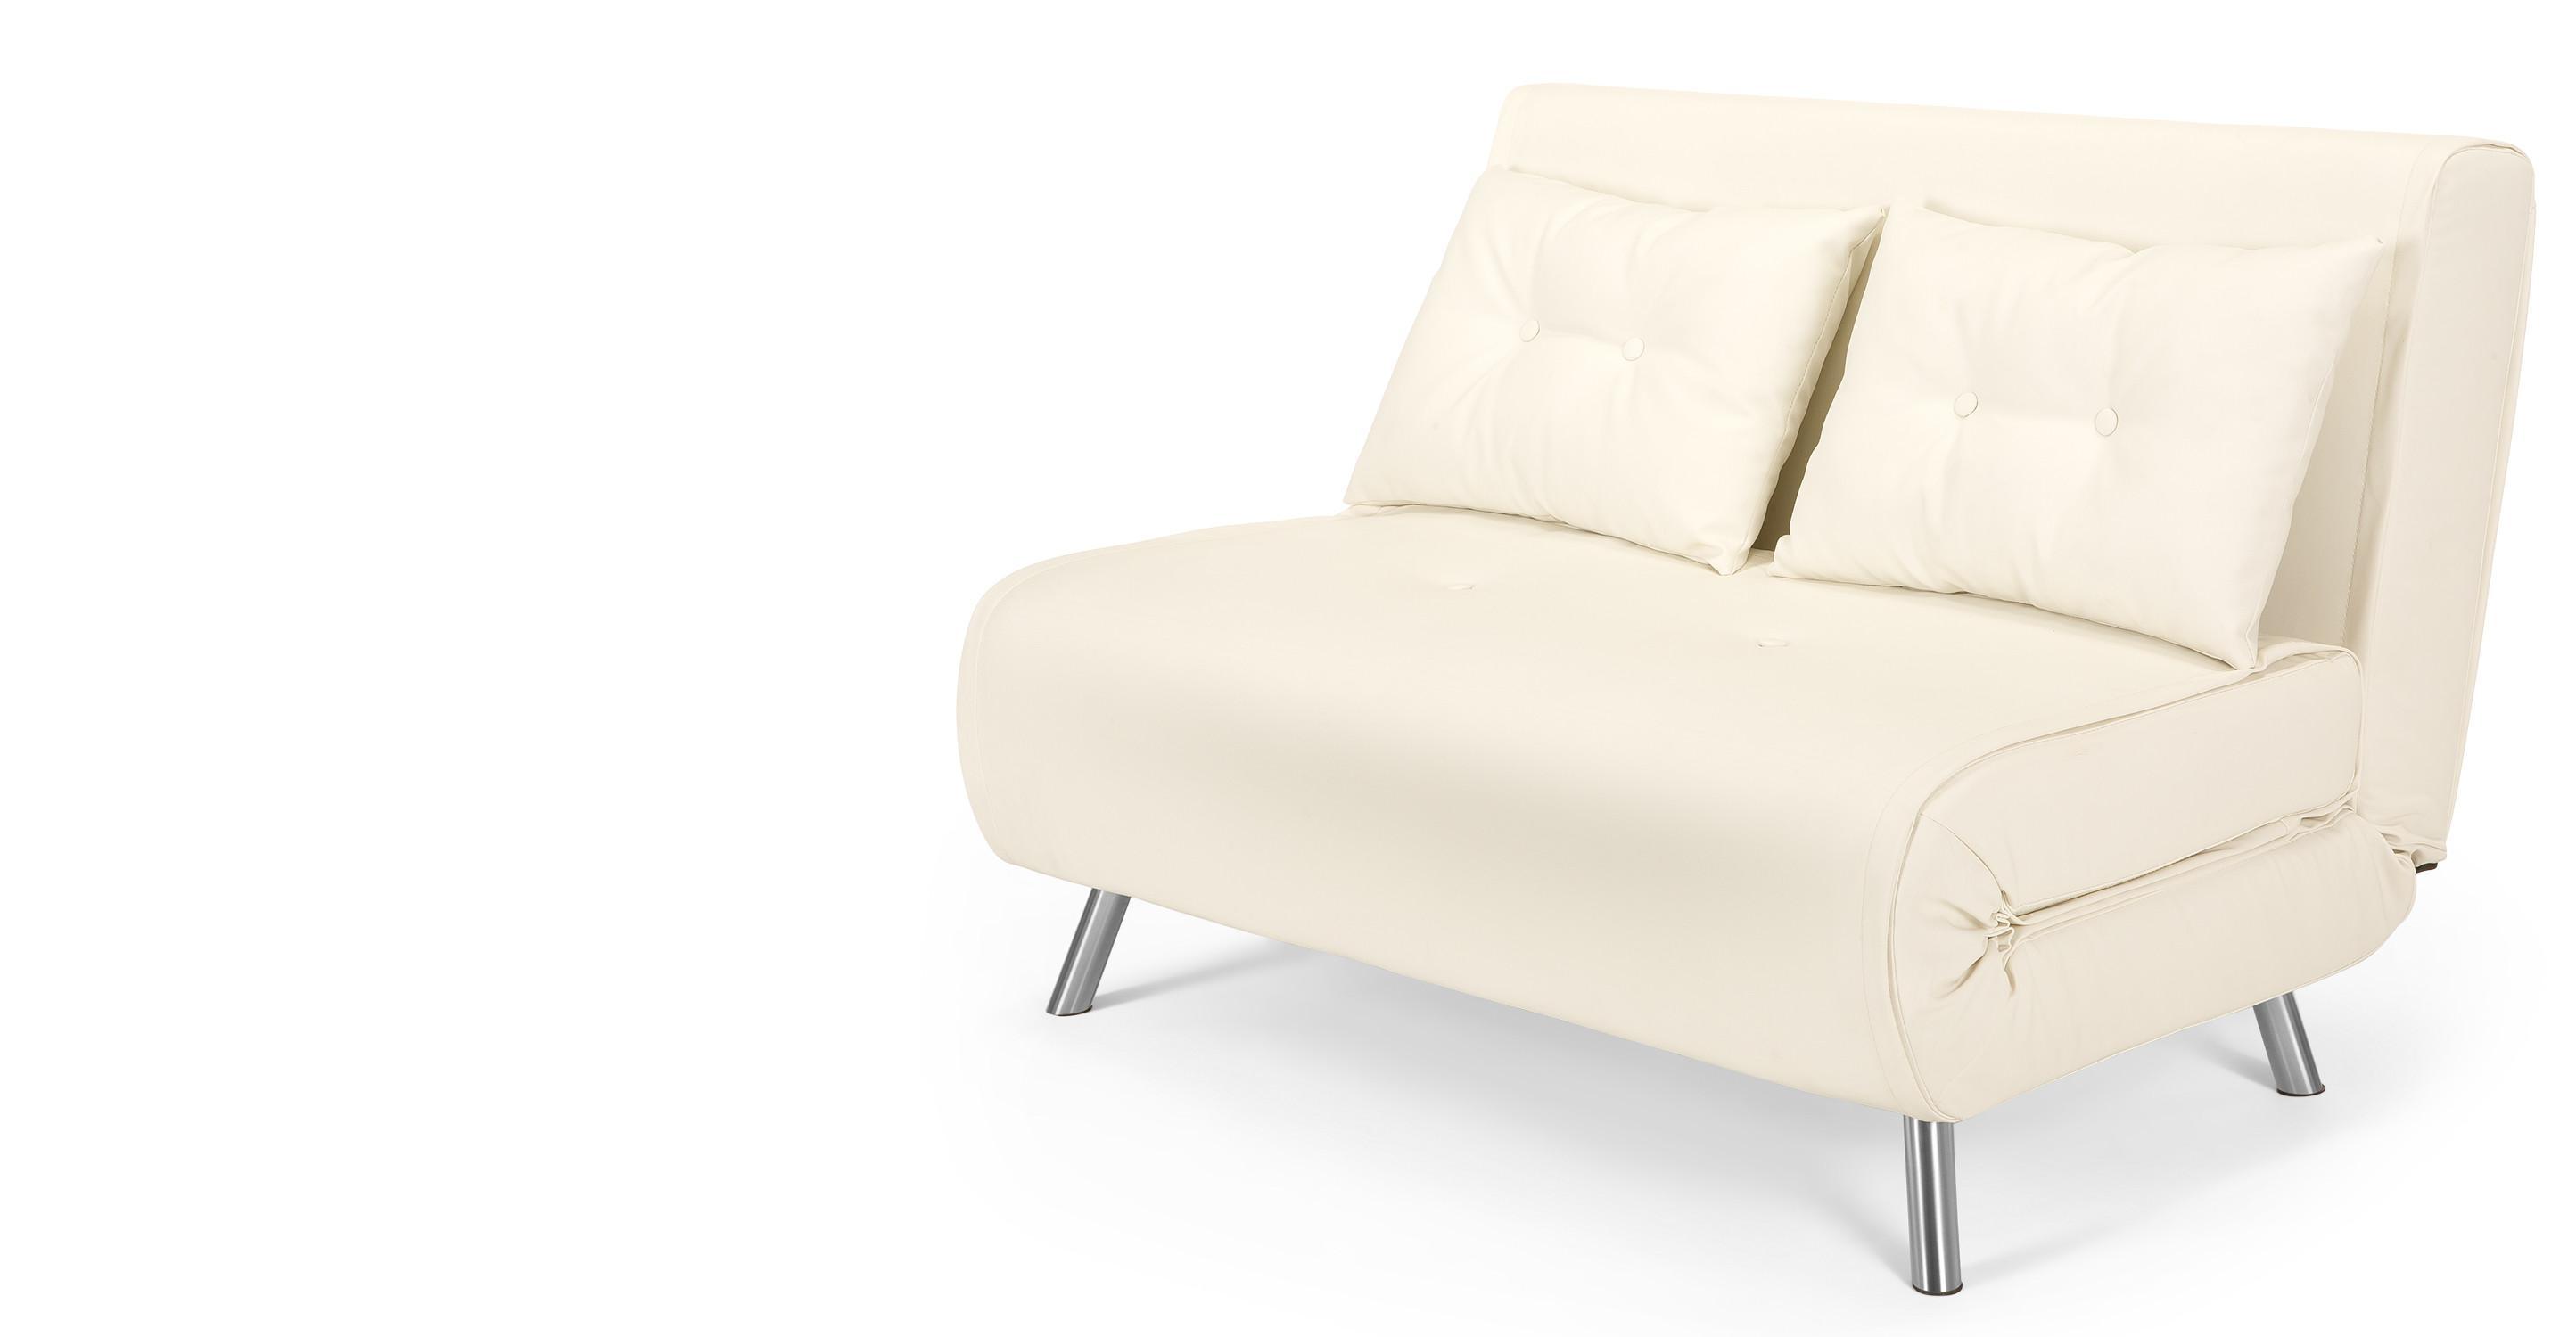 Sofa: Tiny Sofas Pertaining To Tiny Sofas (View 16 of 20)